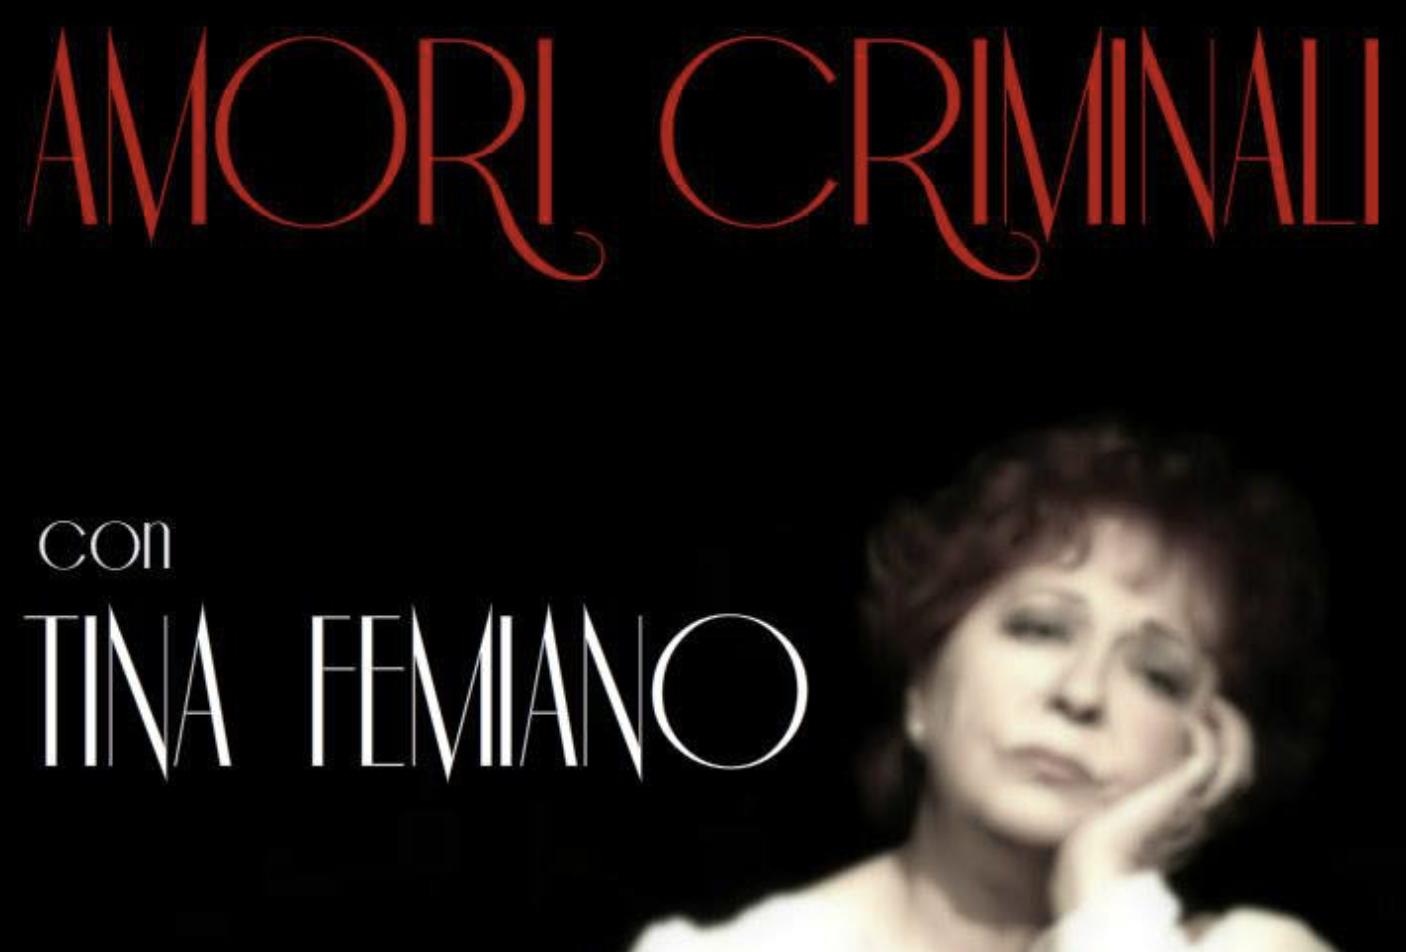 amori criminali